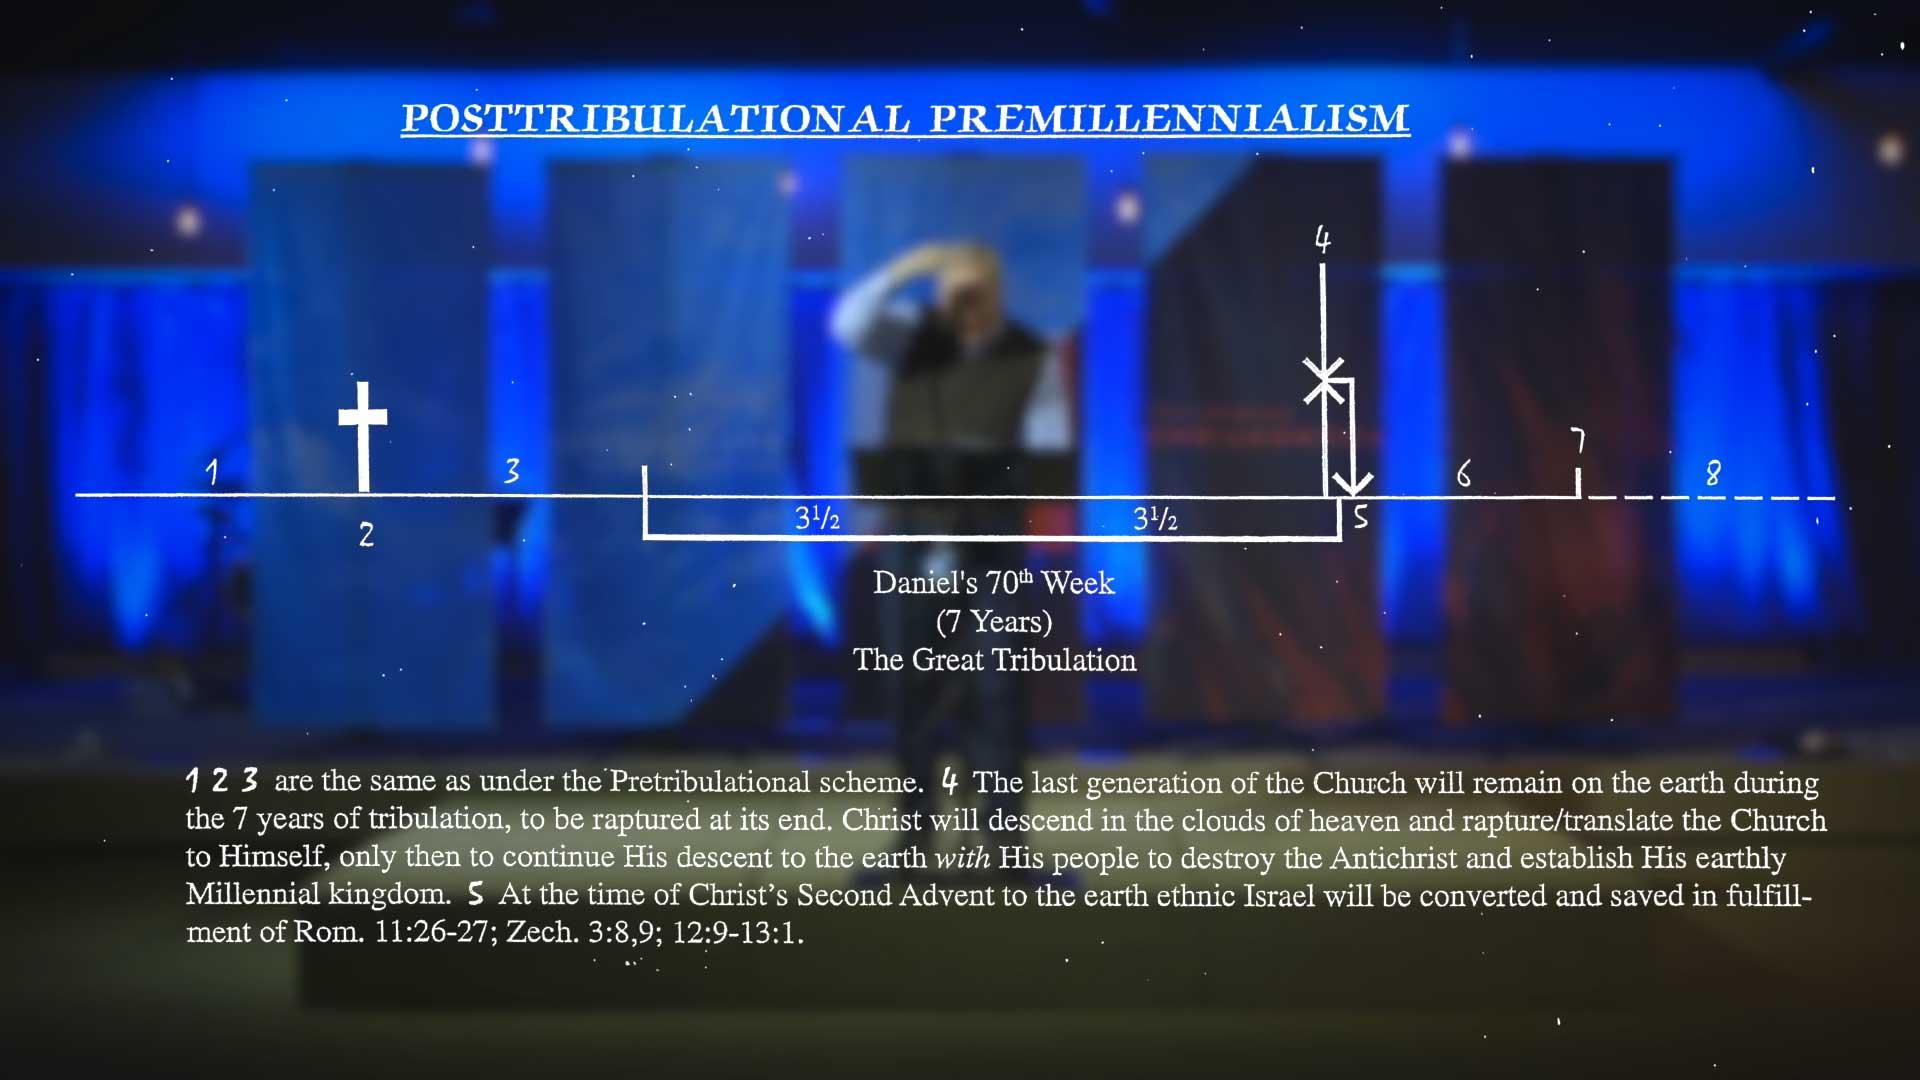 post-tribulational premillennialism